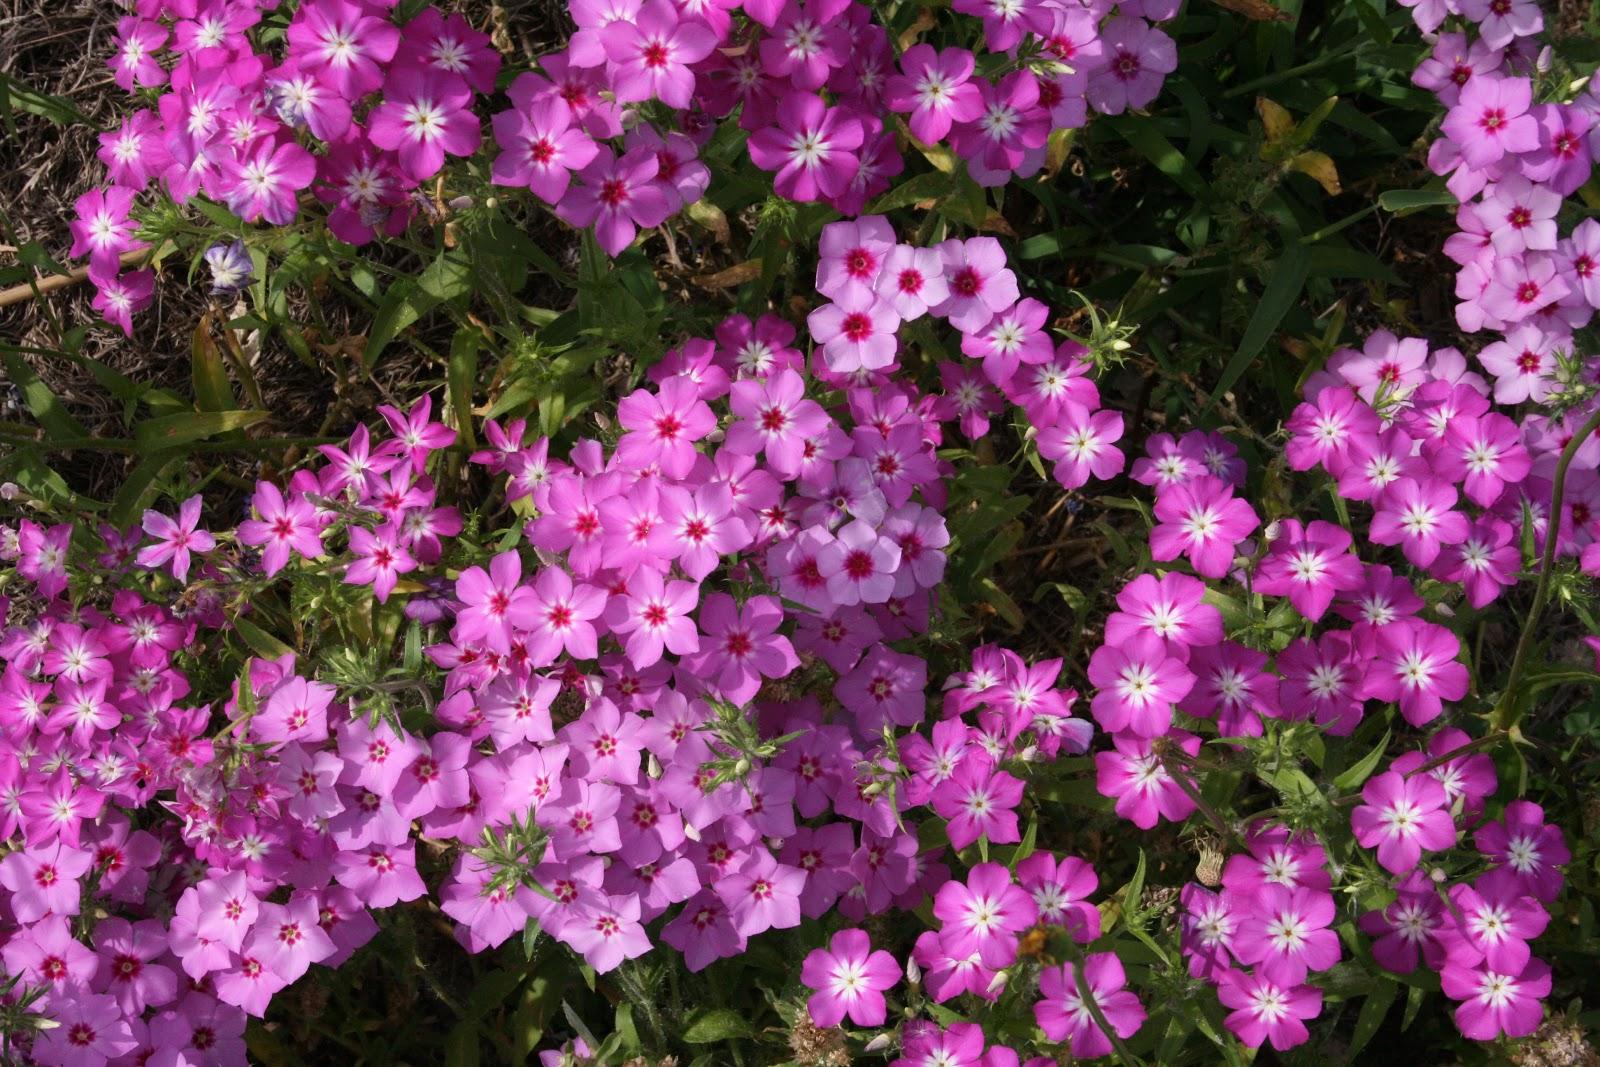 Native florida wildflowers roadside annual phlox phlox drummondii roadside annual phlox phlox drummondii izmirmasajfo